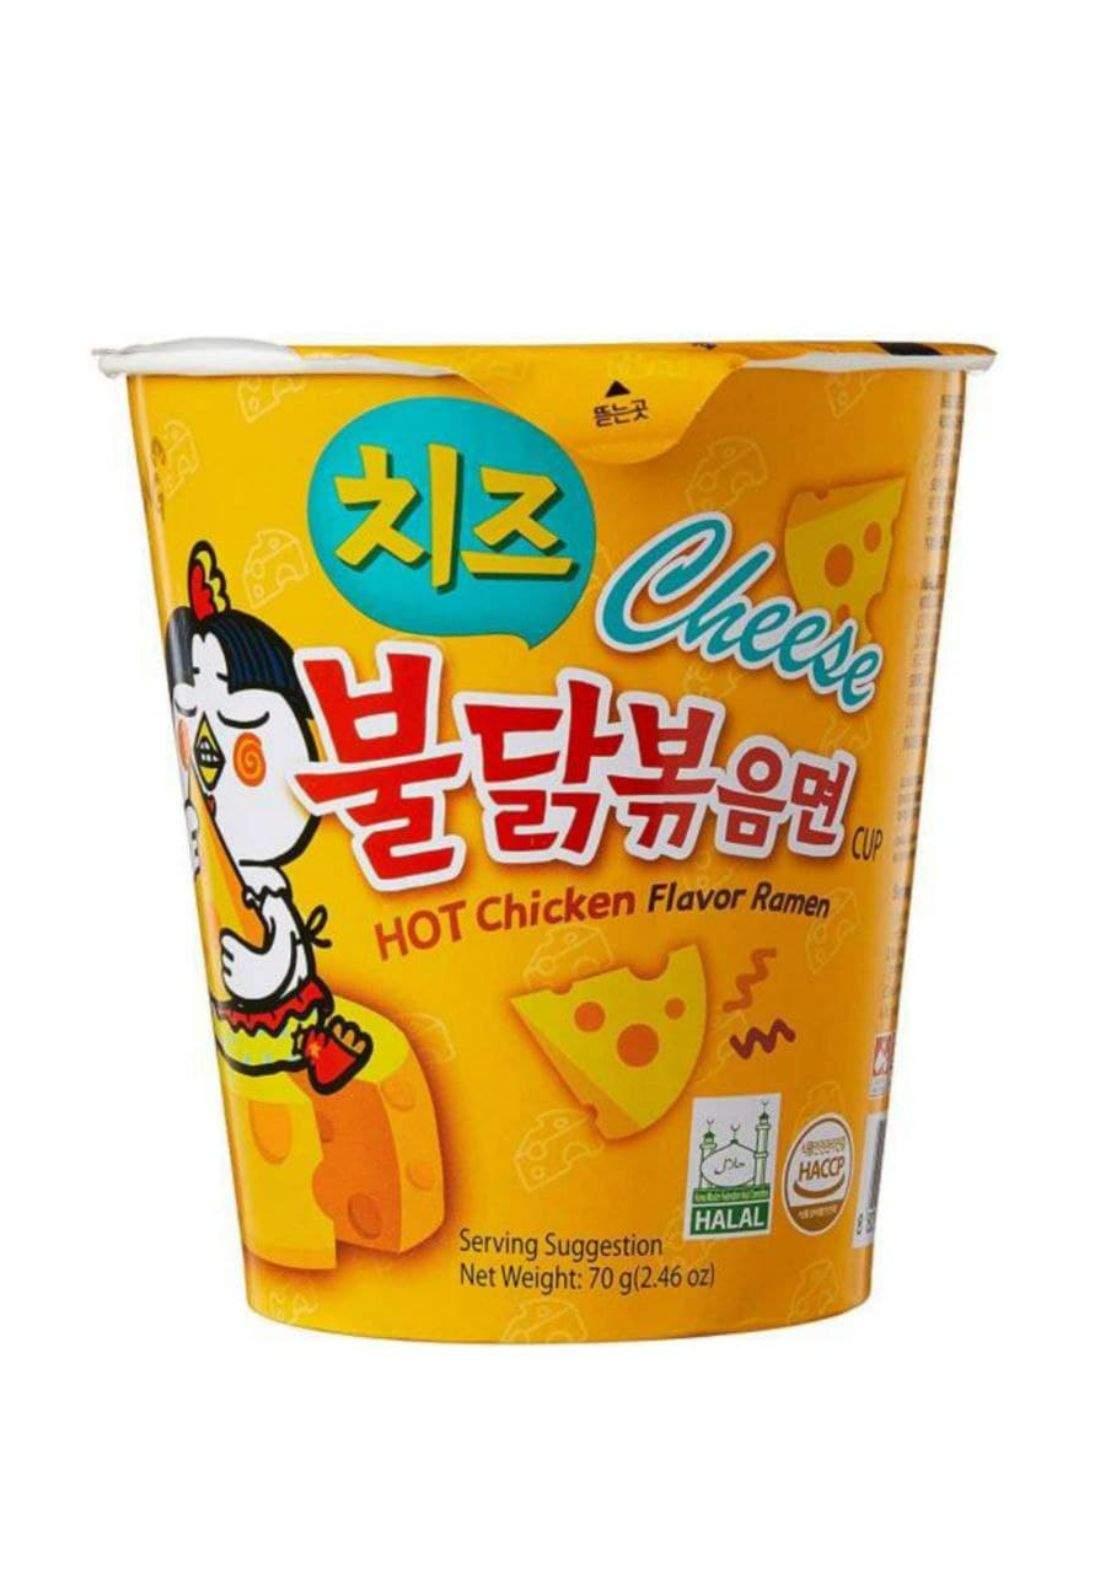 Hot chicken flavor ramen 70g نودلز كوري